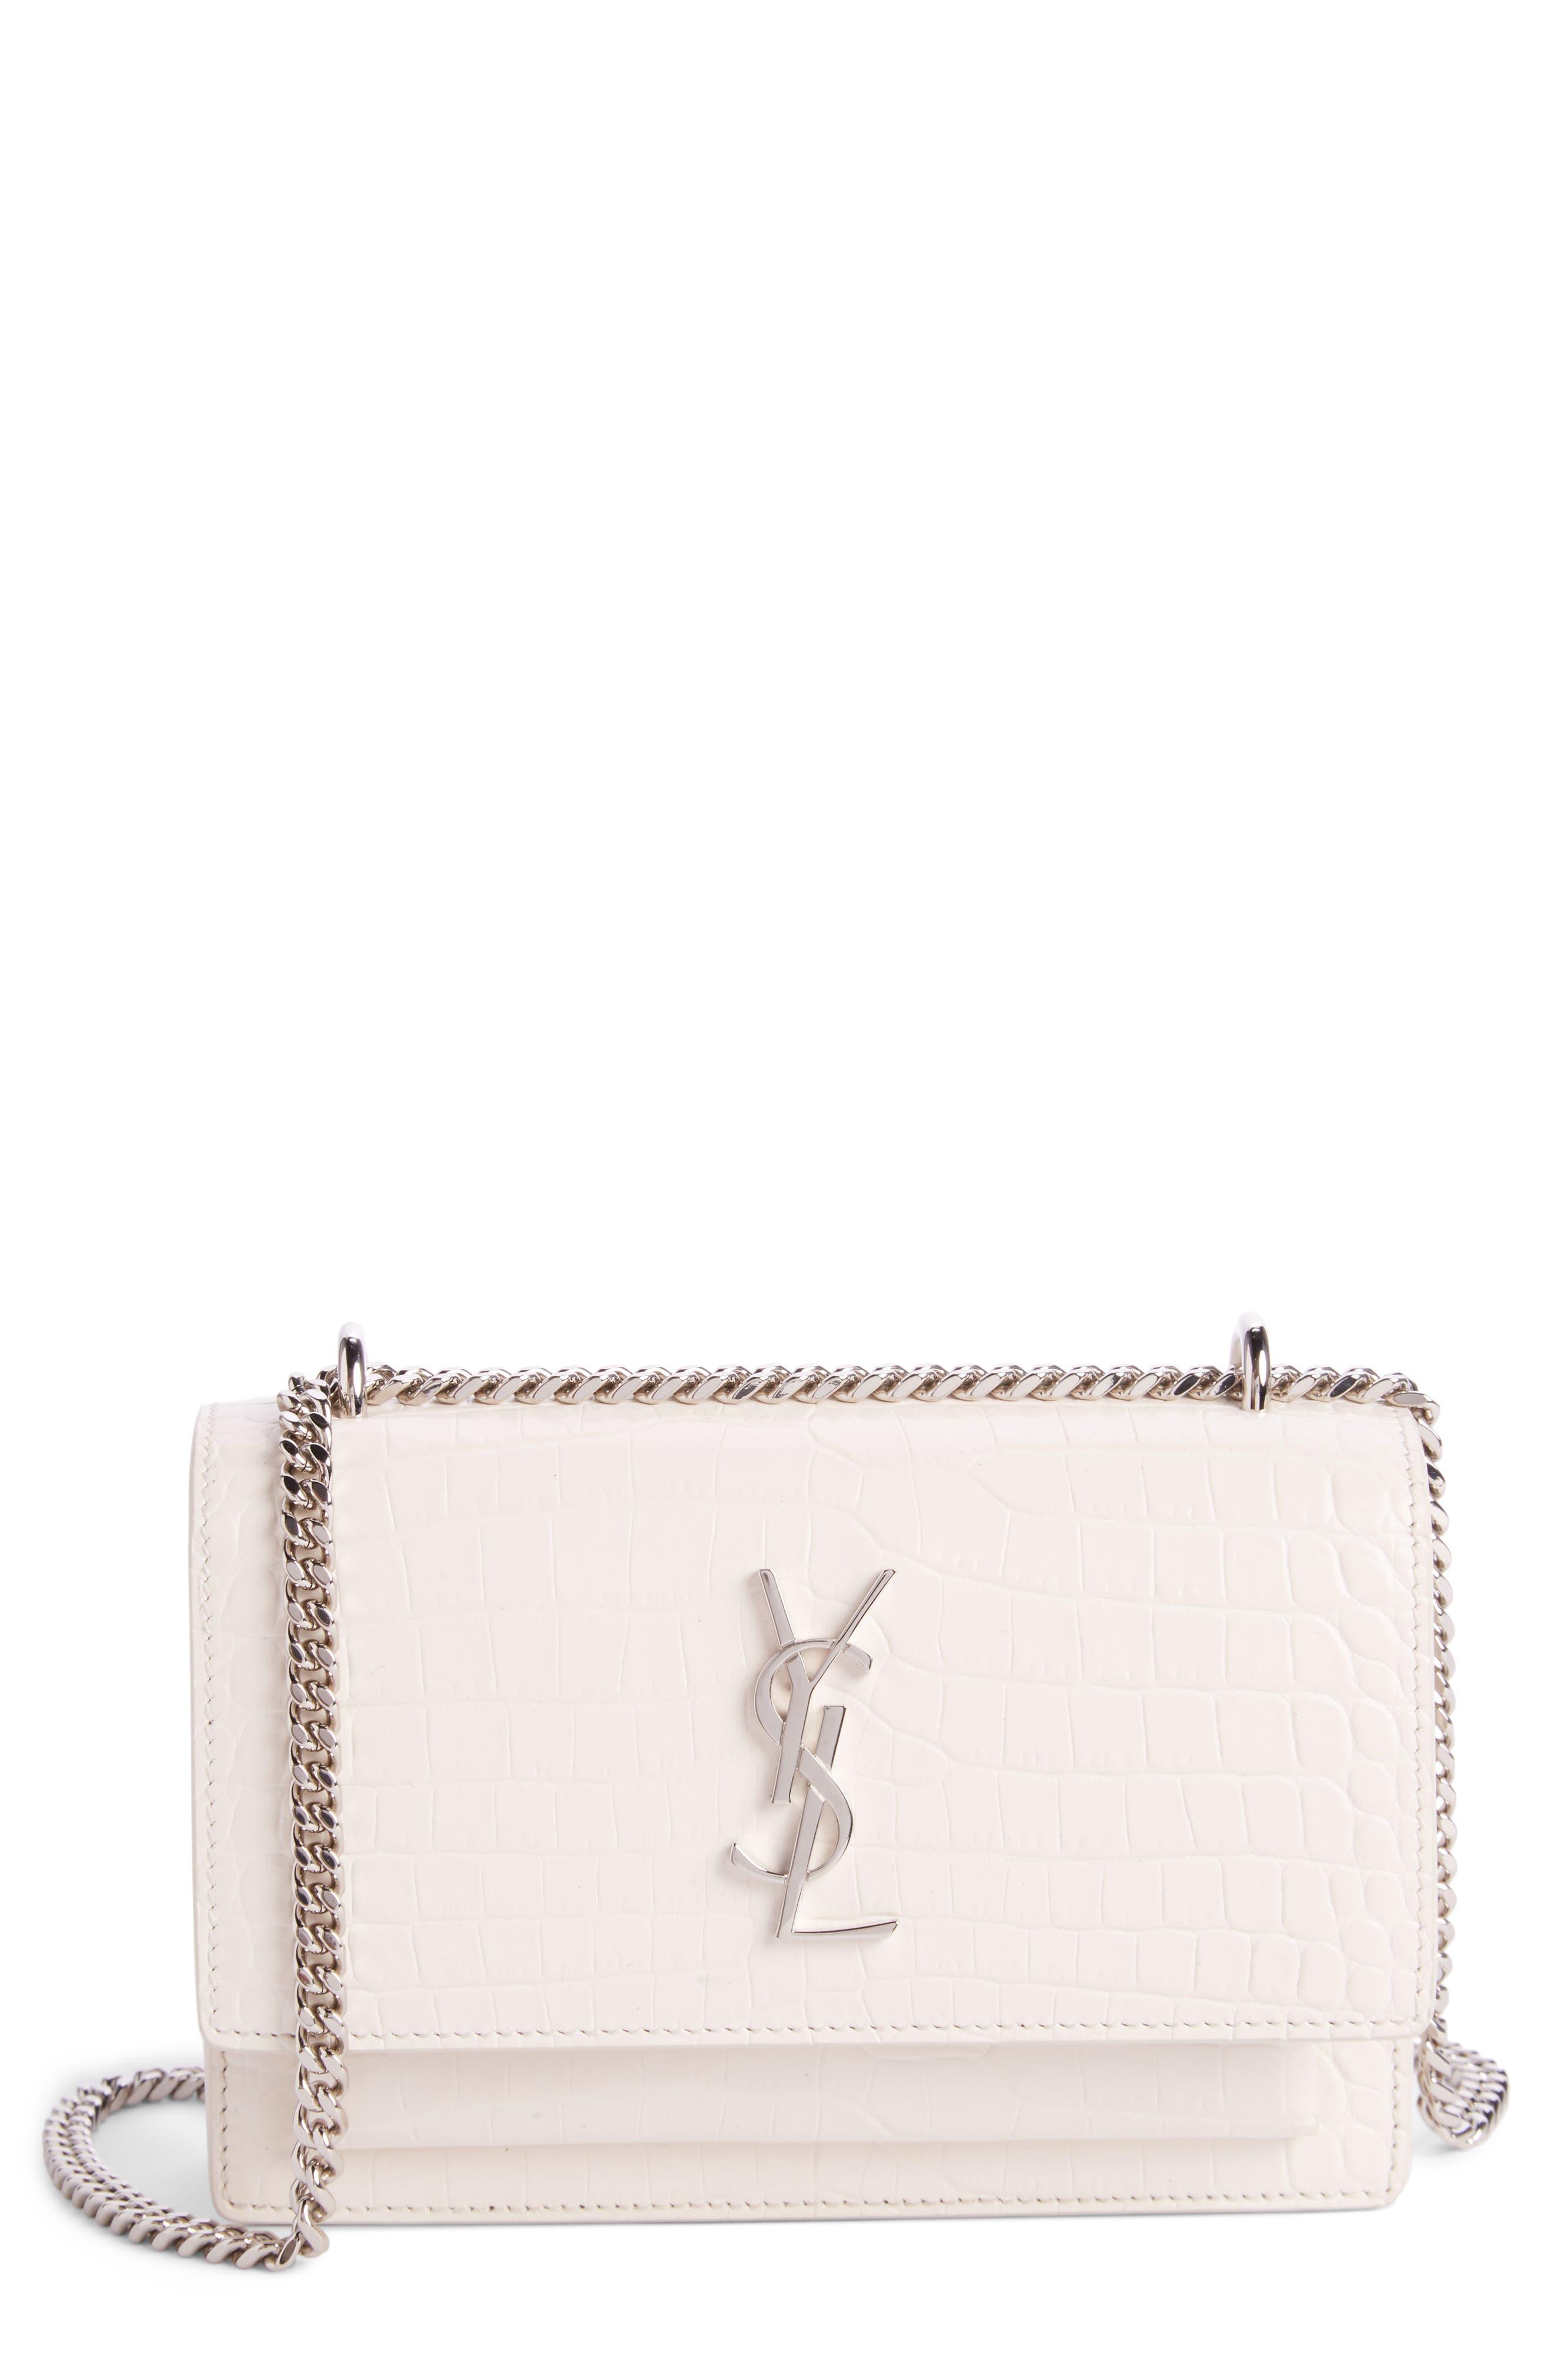 Main Image - Saint Laurent Mini Monogram Sunset Croc Embossed Leather Shoulder Bag